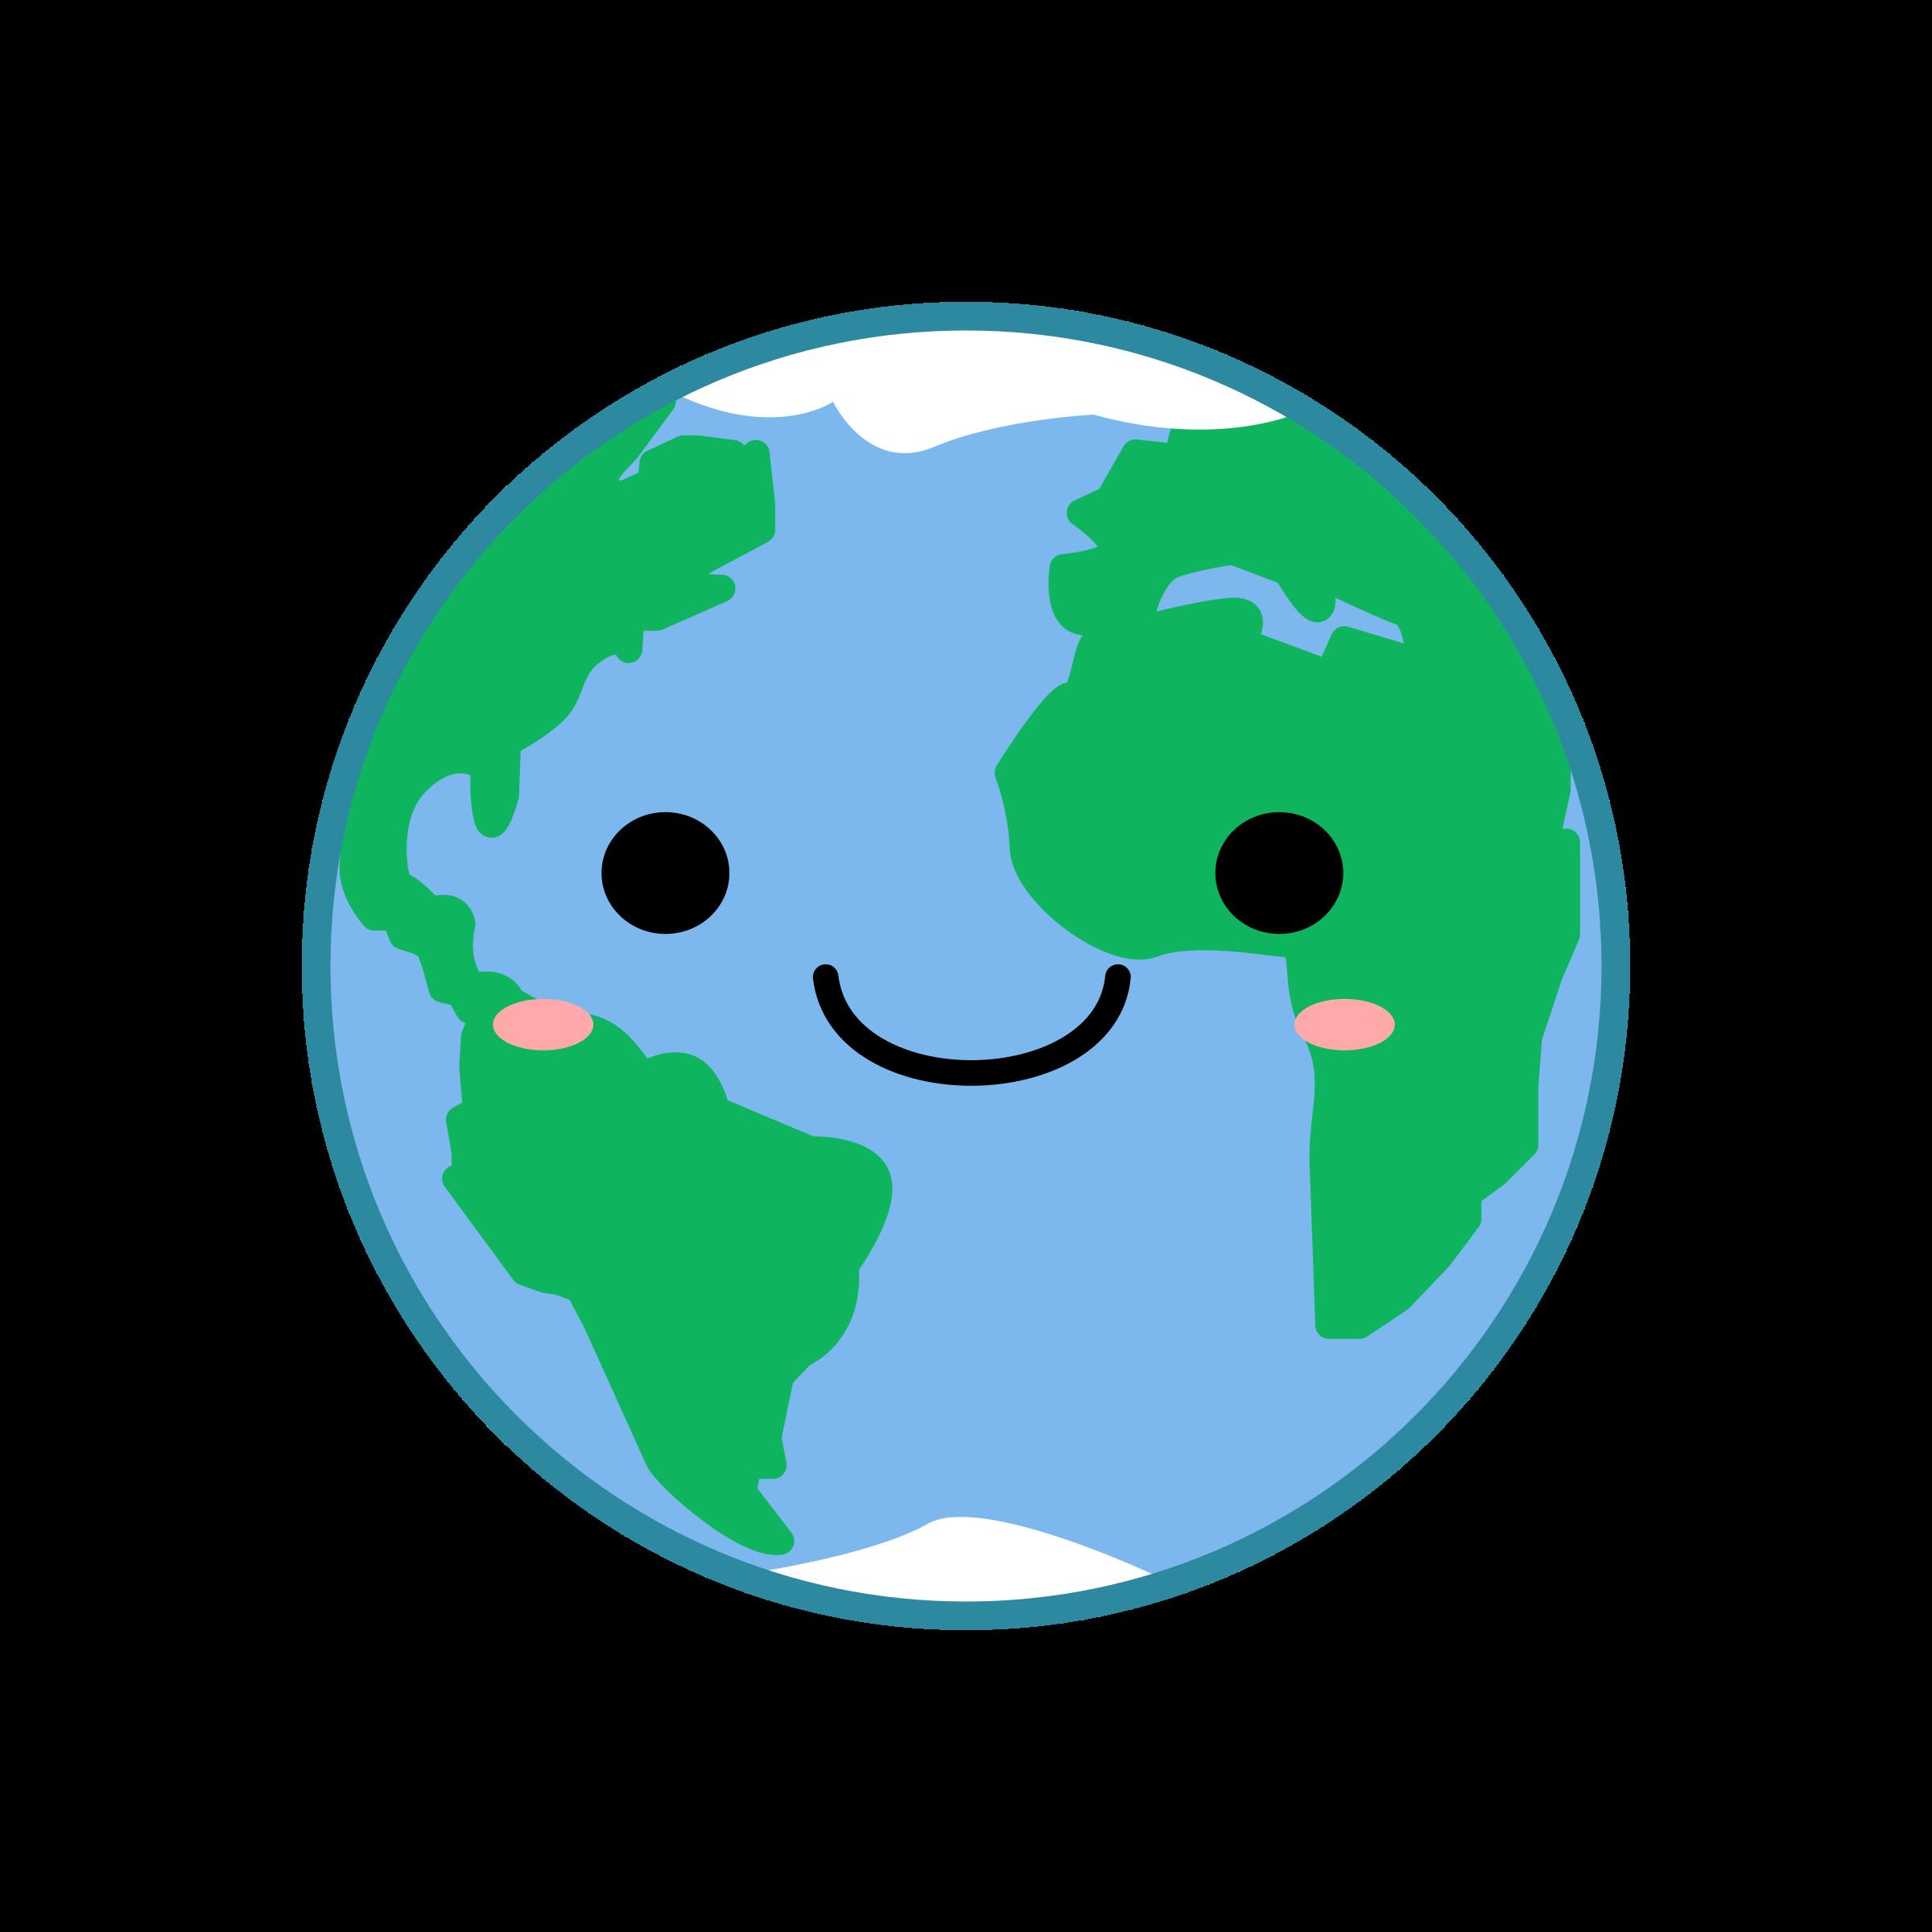 Planet clipart kawaii Kawaii Earth Kawaii Earth Clipart